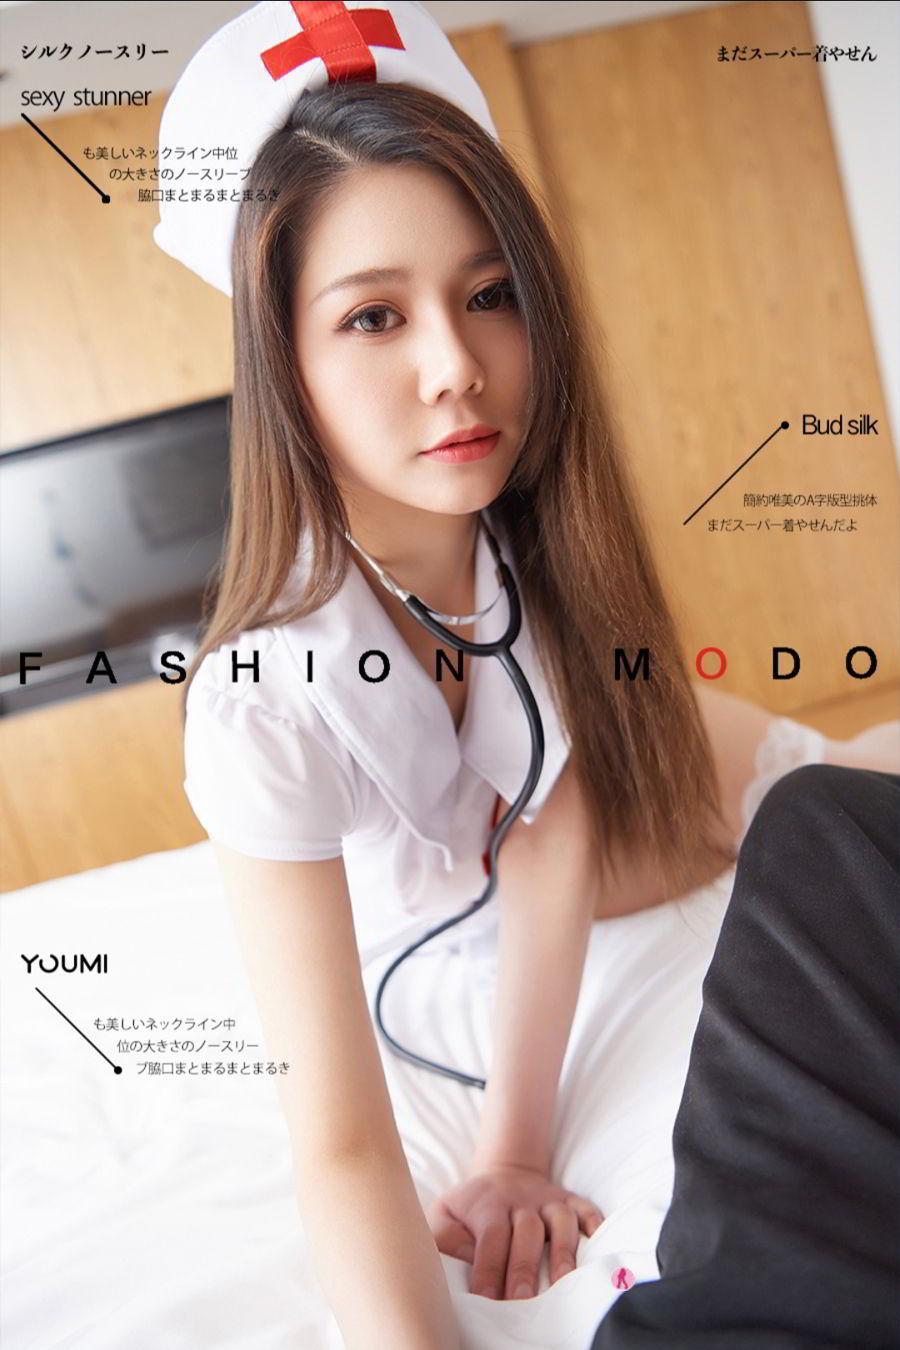 Vol.398 护士装制服诱惑丝袜美腿丁字裤美女模特Youmi尤蜜-如歌fairy完整私房照合集